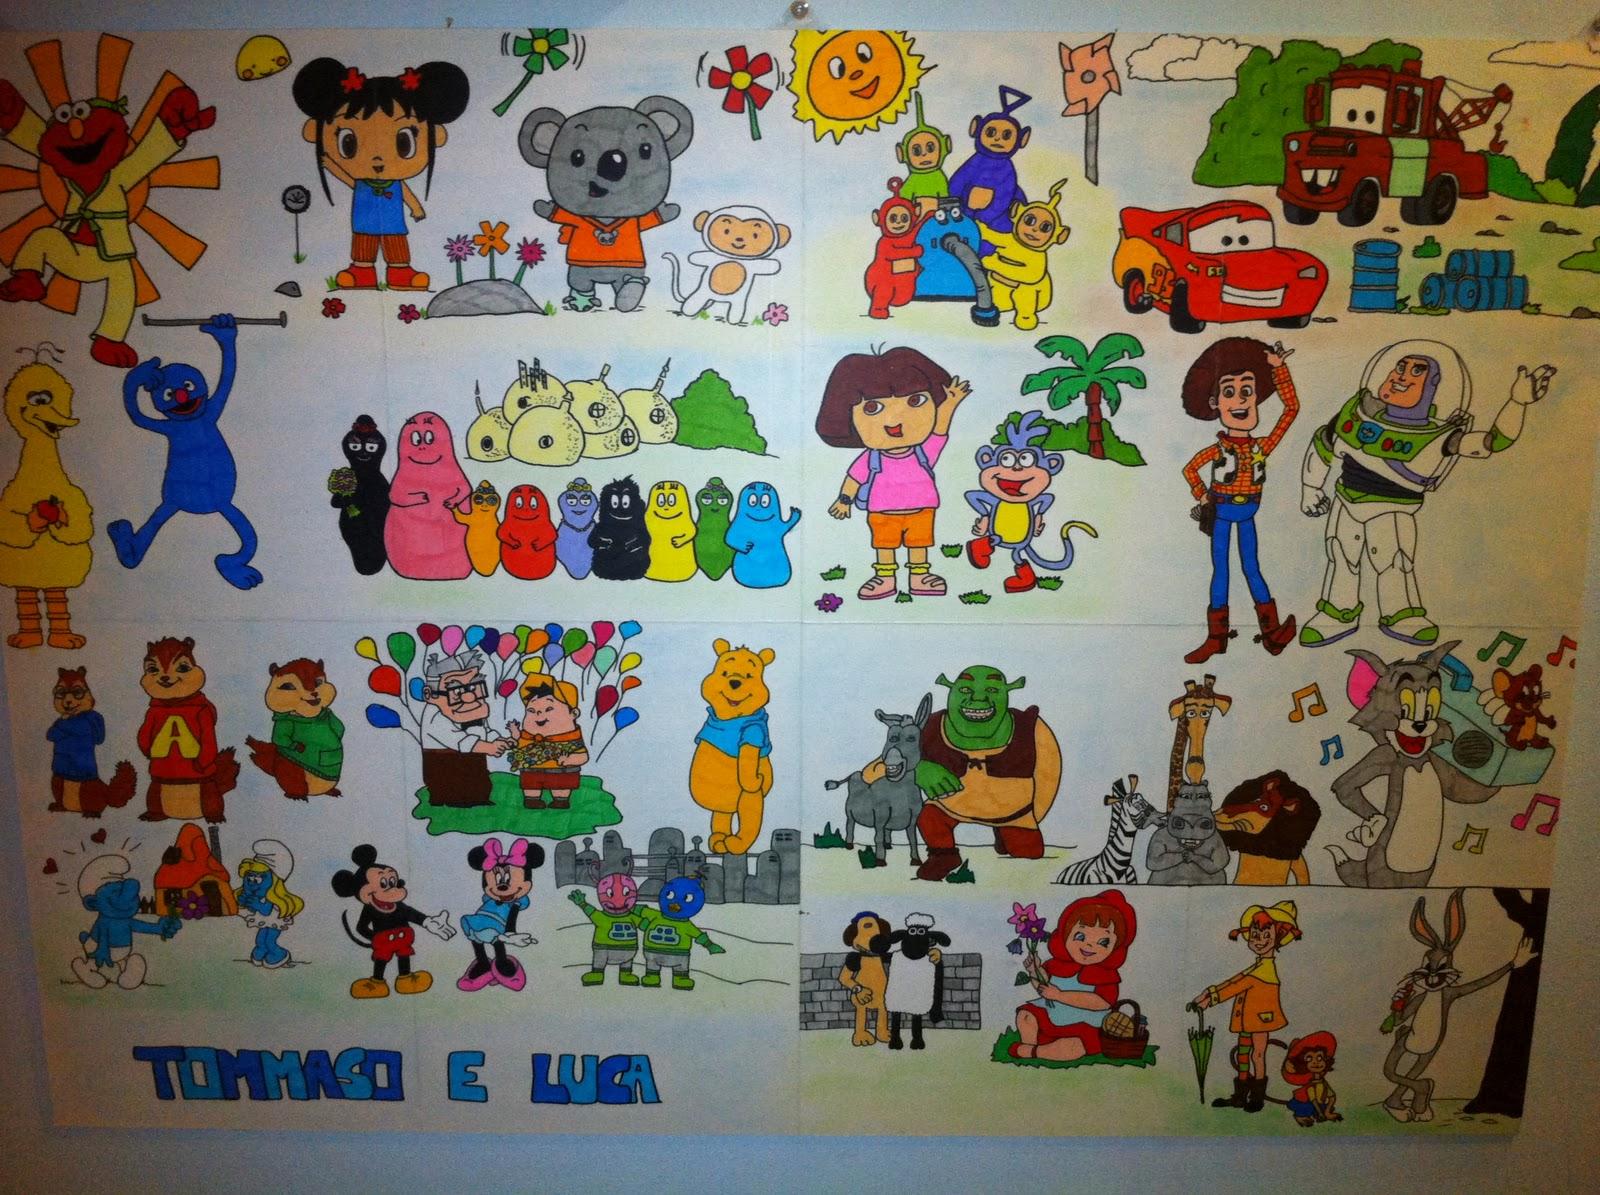 Bambini golosi disegni di cartoni animati per i miei